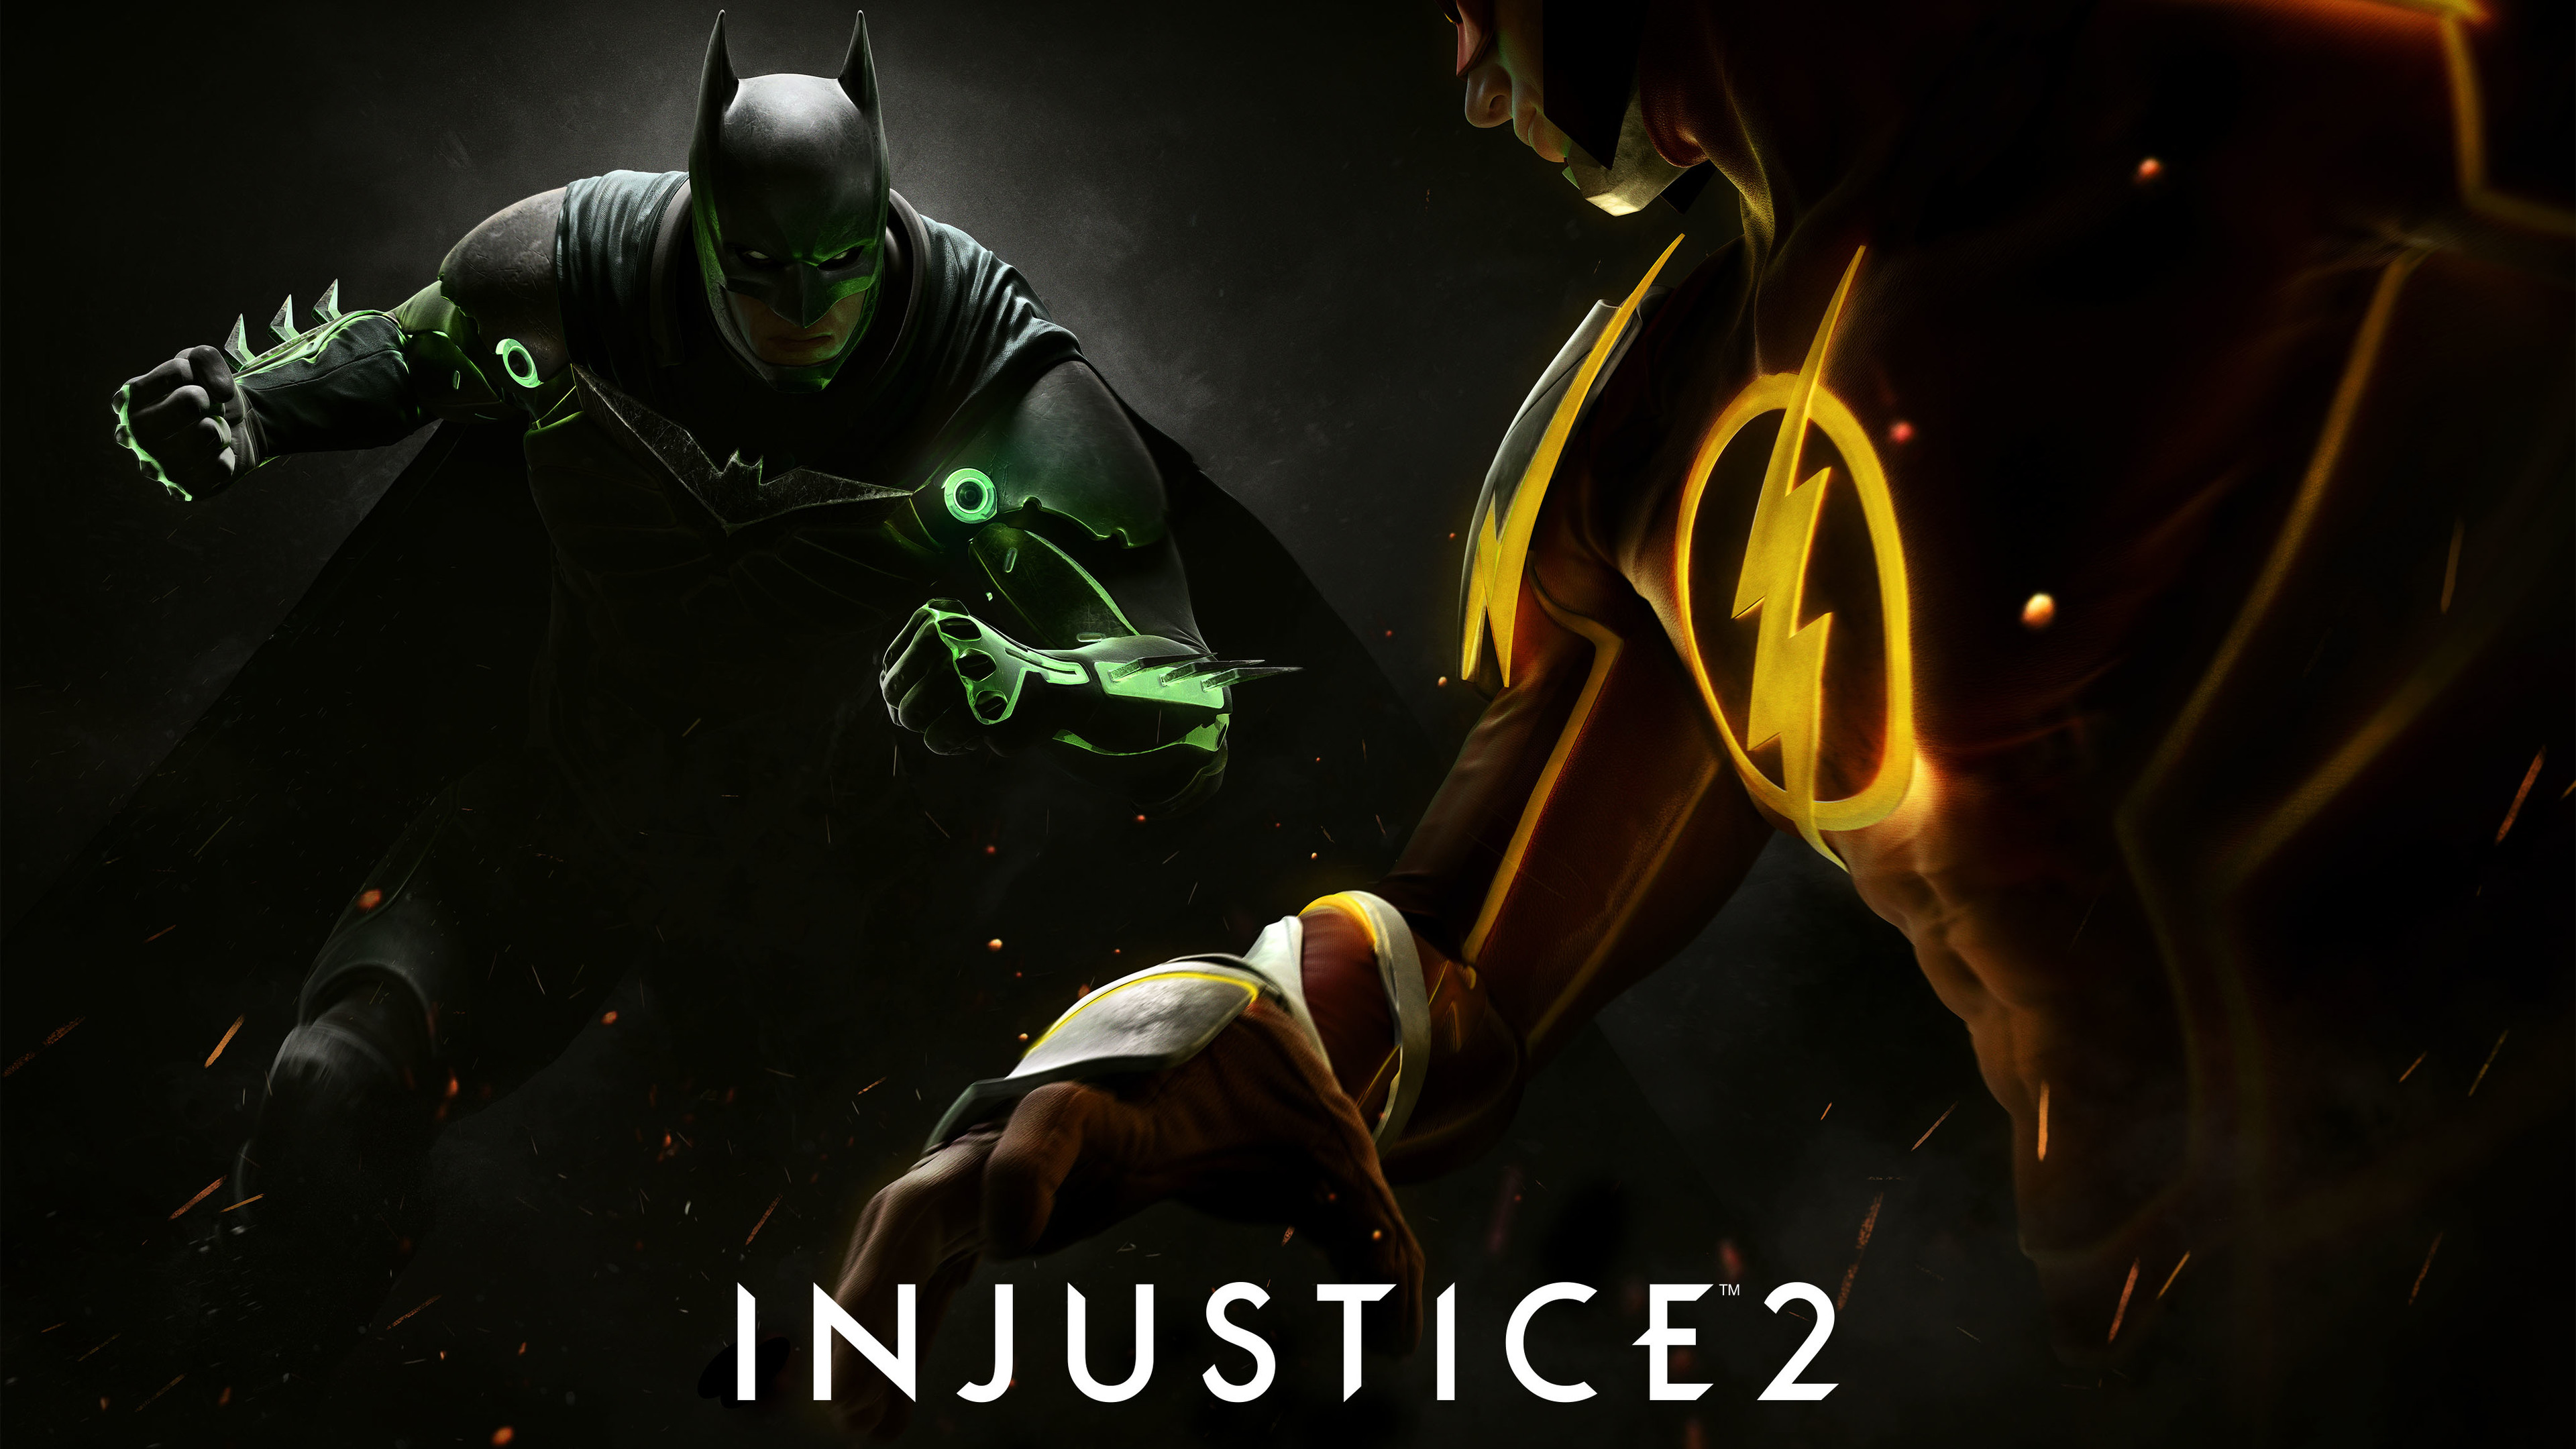 injustice 2 original 1536010160 - Injustice 2 Original - ps games wallpapers, injustice 2 wallpapers, 2017 games wallpapers